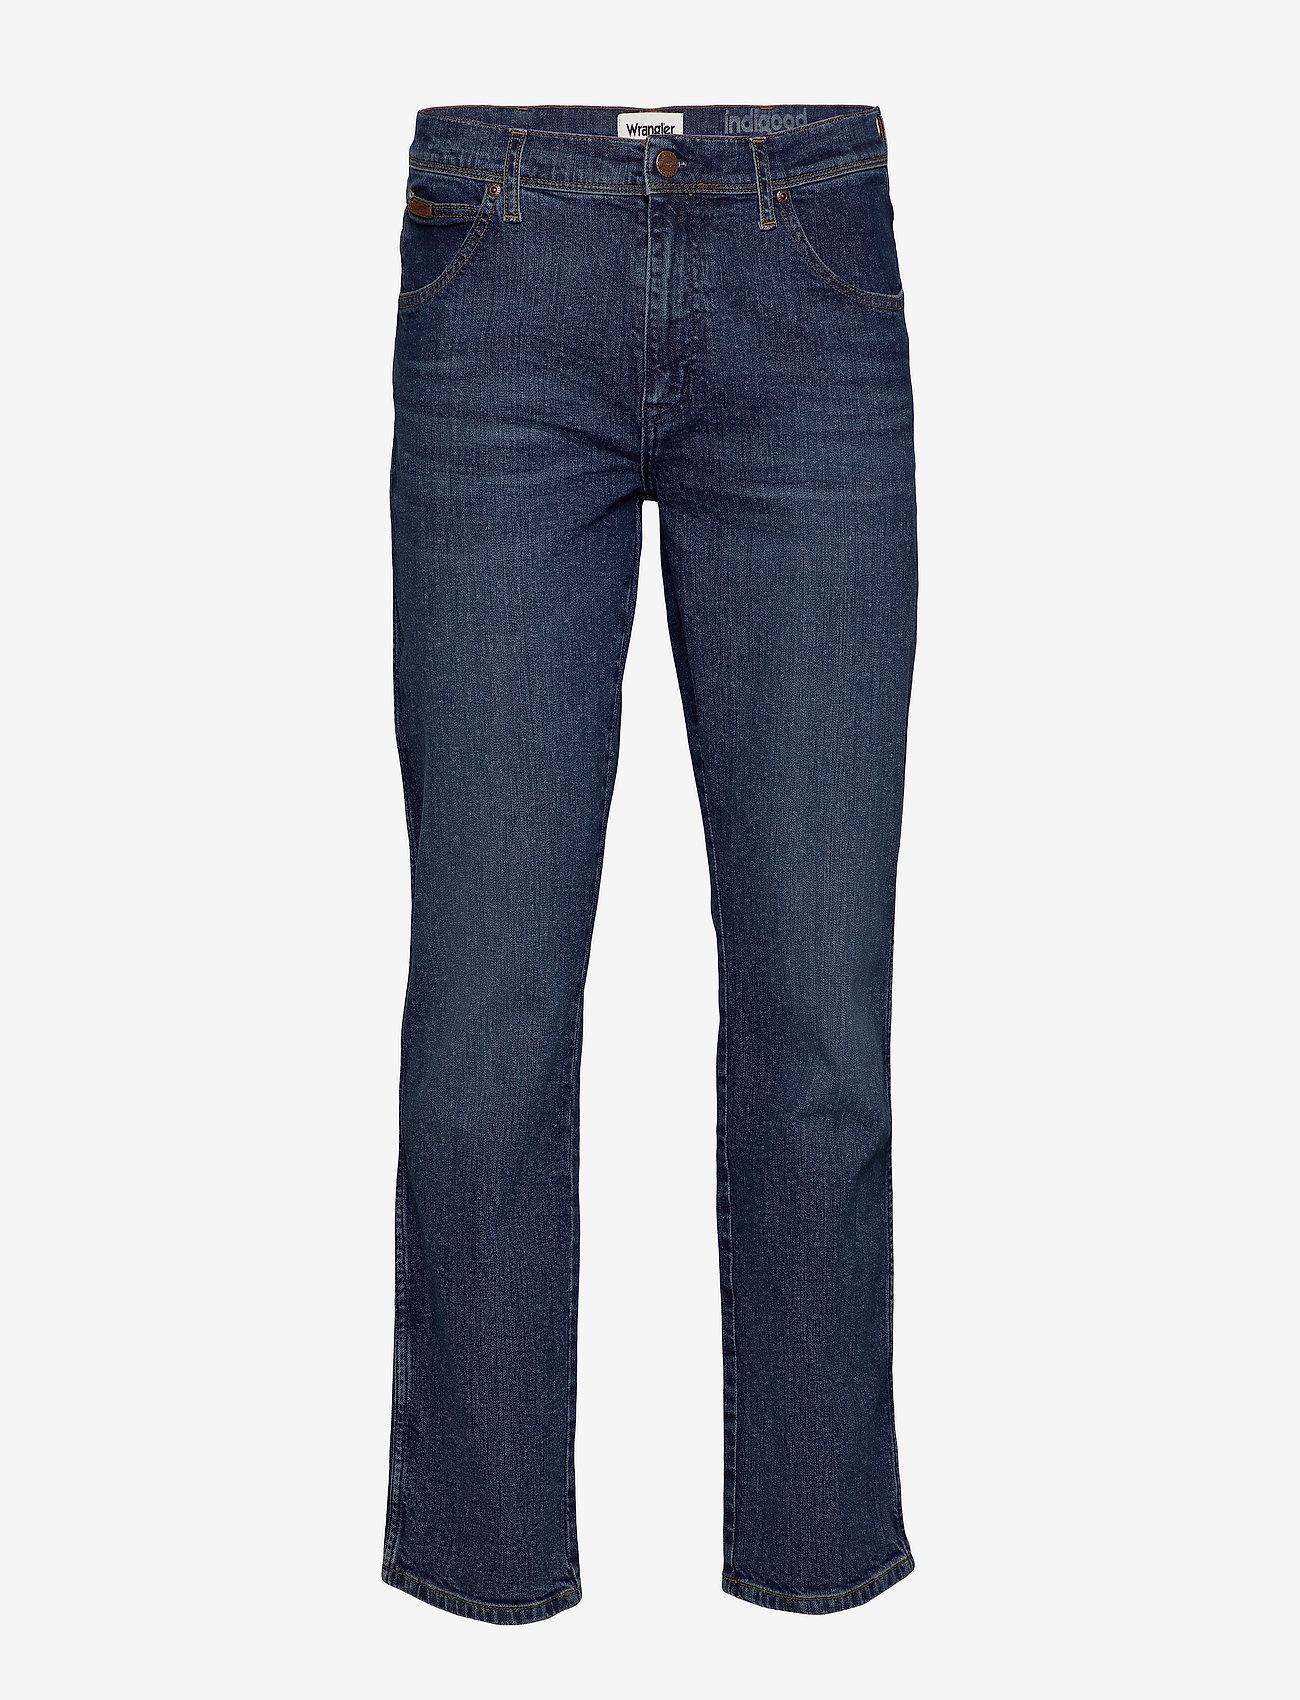 Wrangler - TEXAS - slim jeans - the legend